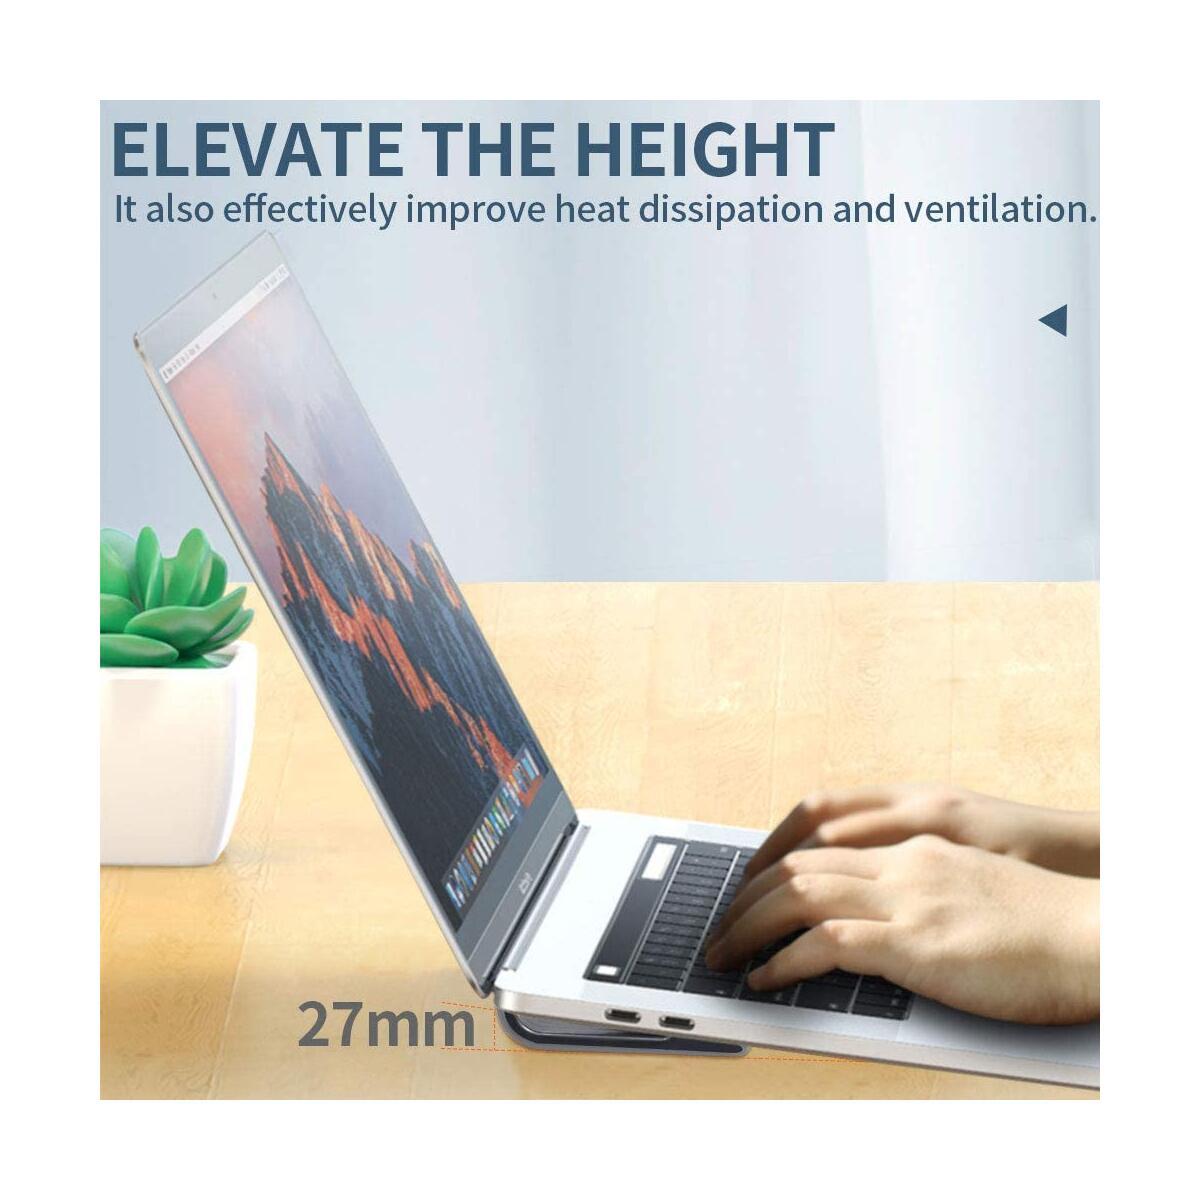 4 Pack Universal Laptop Stands, Portable Lightweight Anti-Slip Silicone Desk Riser Durable Flatform Stable Kickstand